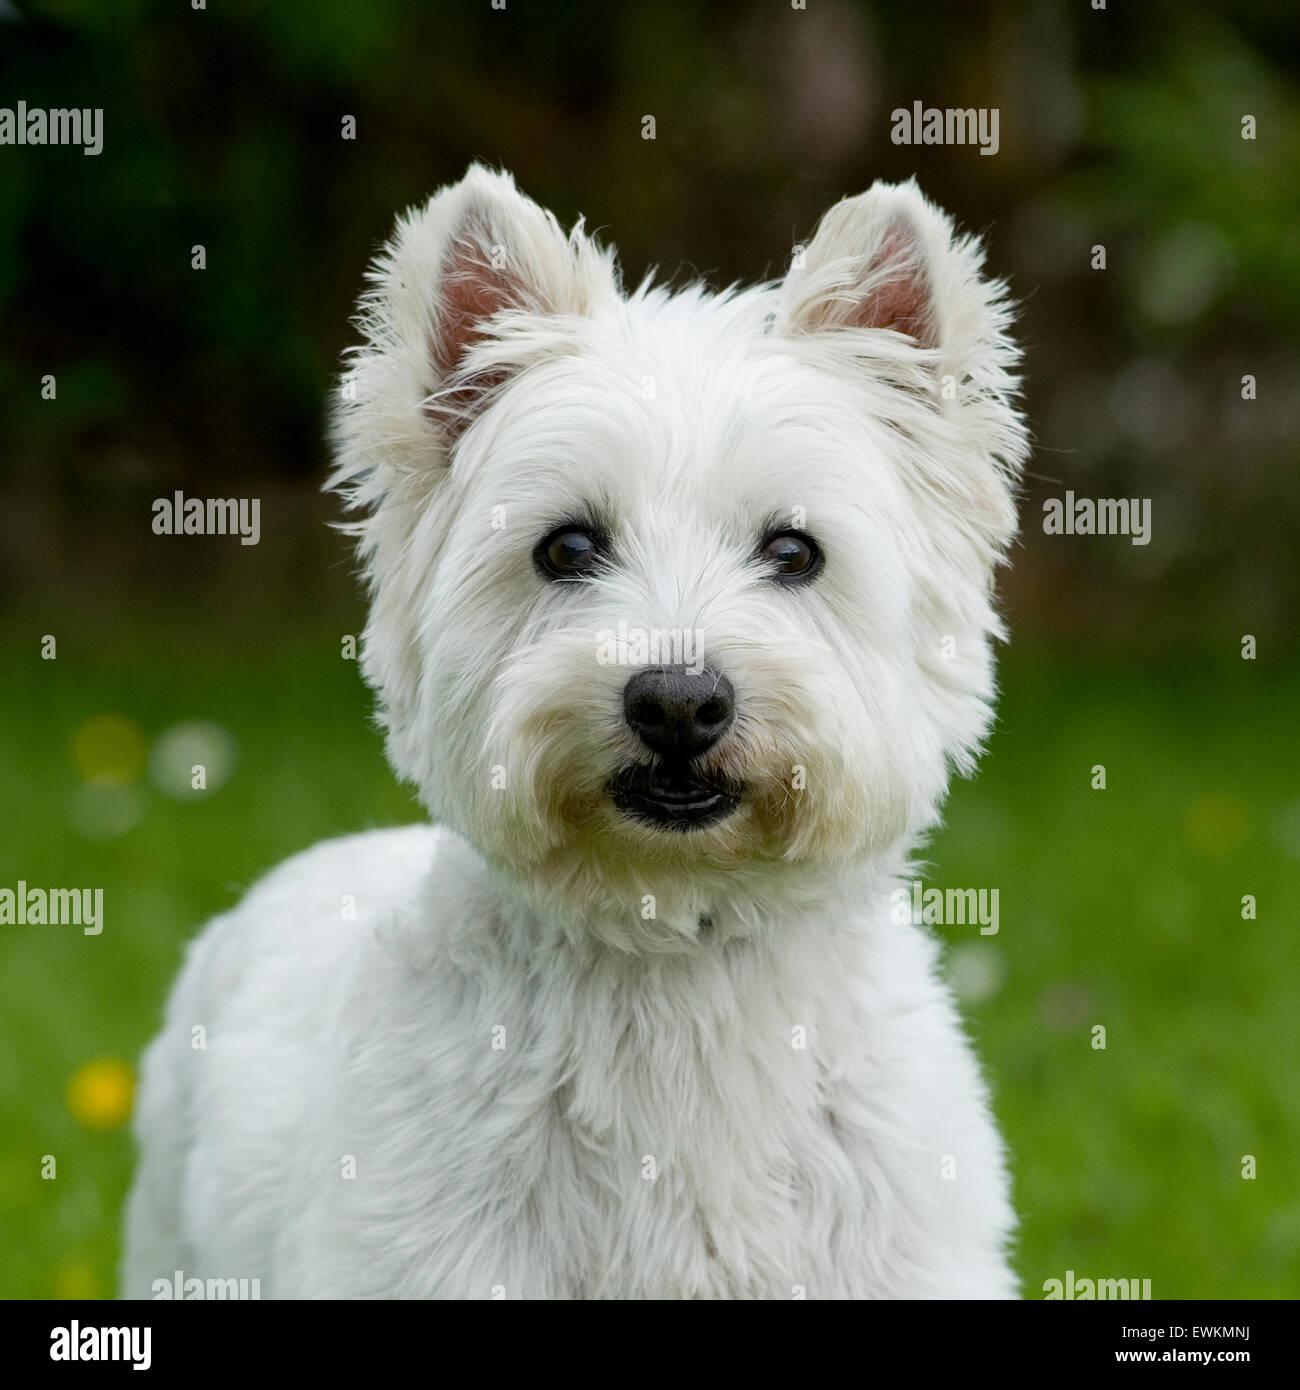 west highland white terrier - Stock Image